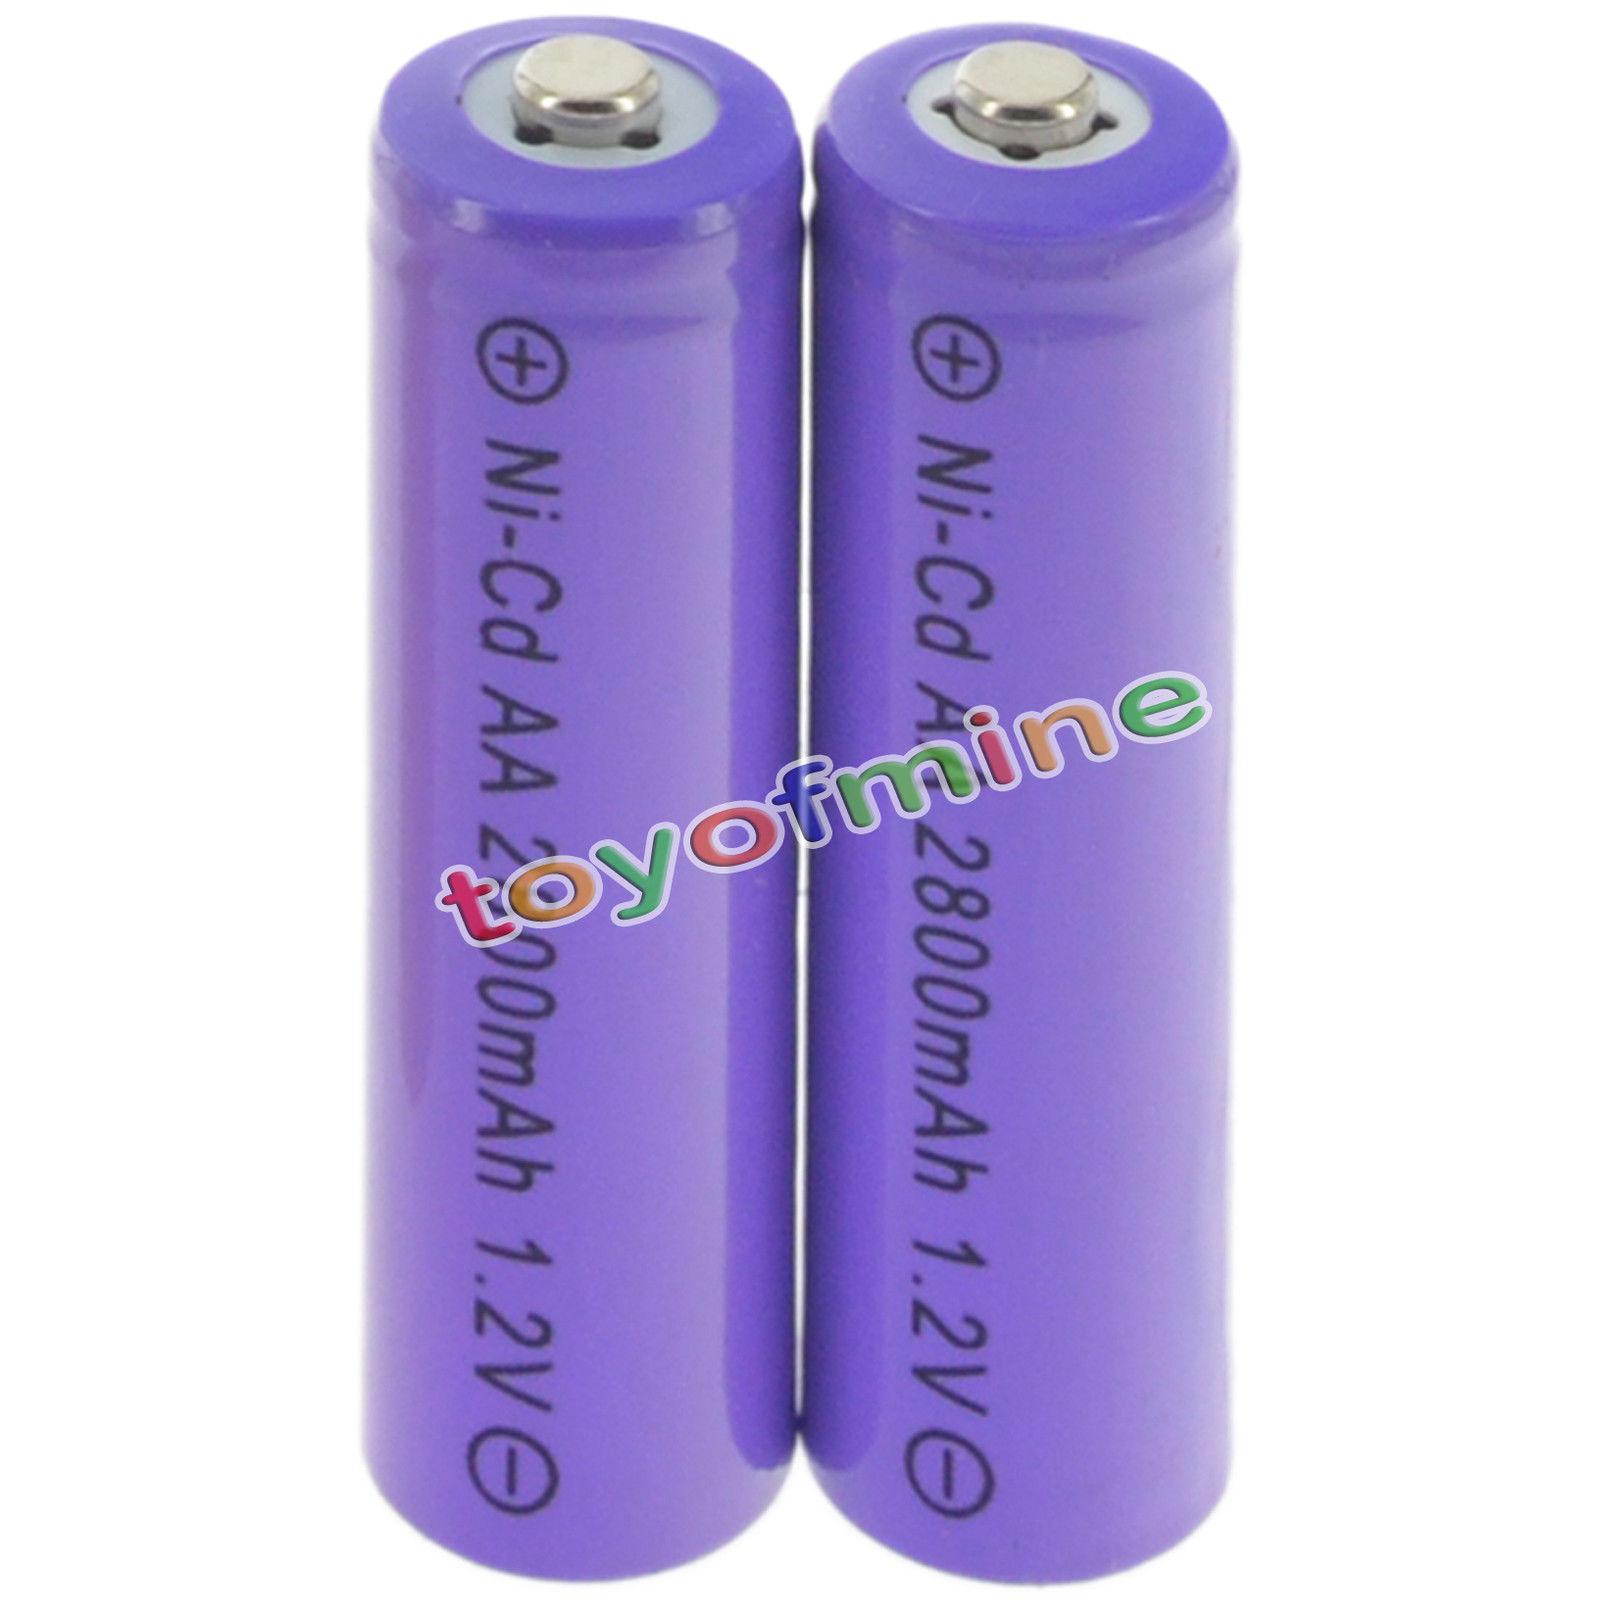 2 8 Aud 2 Aa Random Rechargeable Batteries Nicd 2800mah 1 2v Garden Solar Light Lamp Ebay Electronics Solar Lights Lamp Light Solar